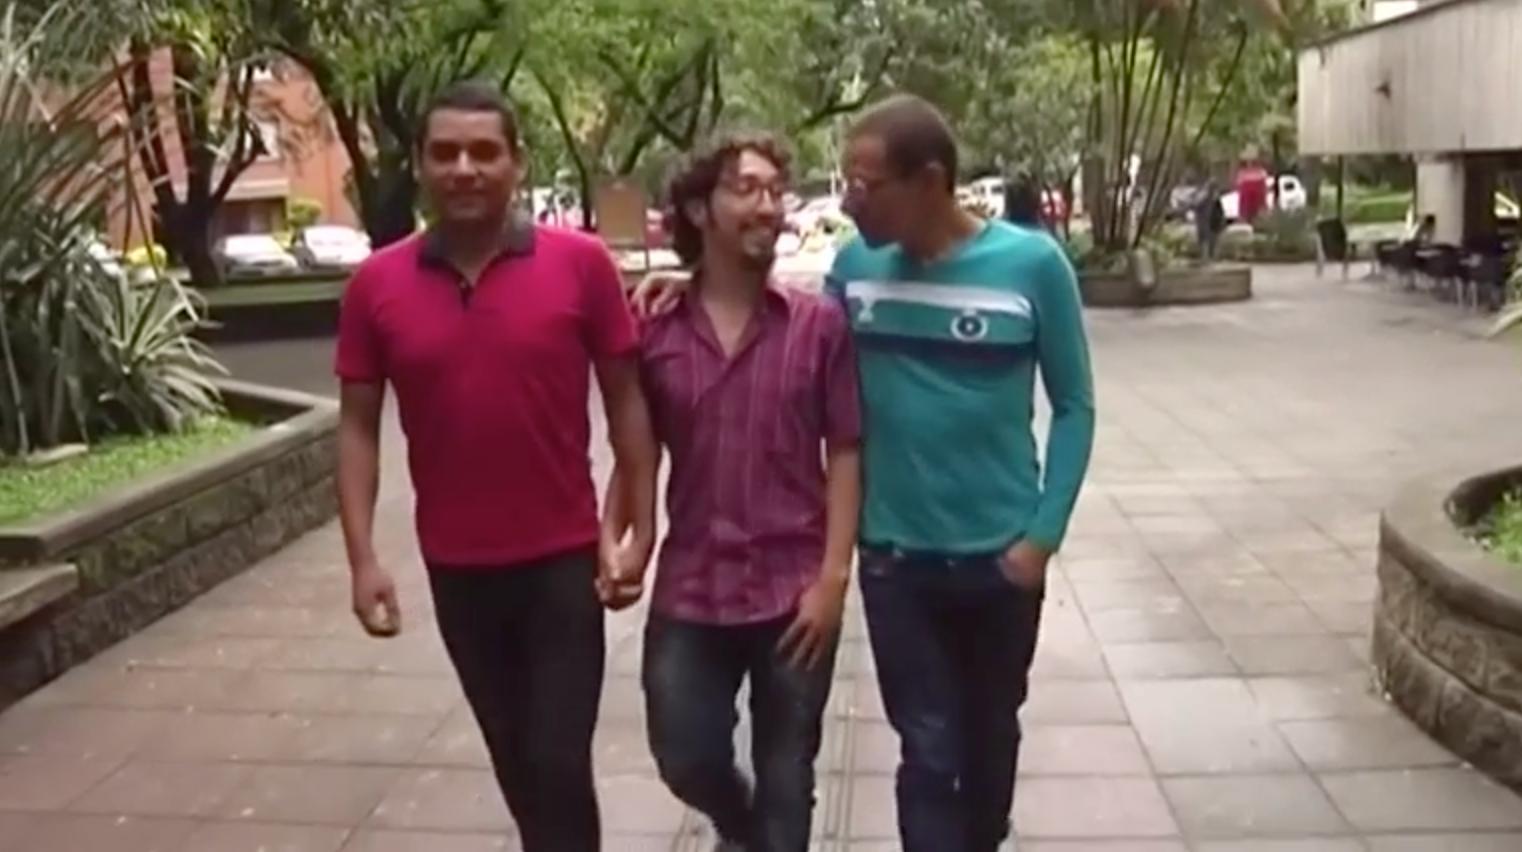 datovania Gay rakovinu mužanajlepšie dátumové údaje lokalít Peking